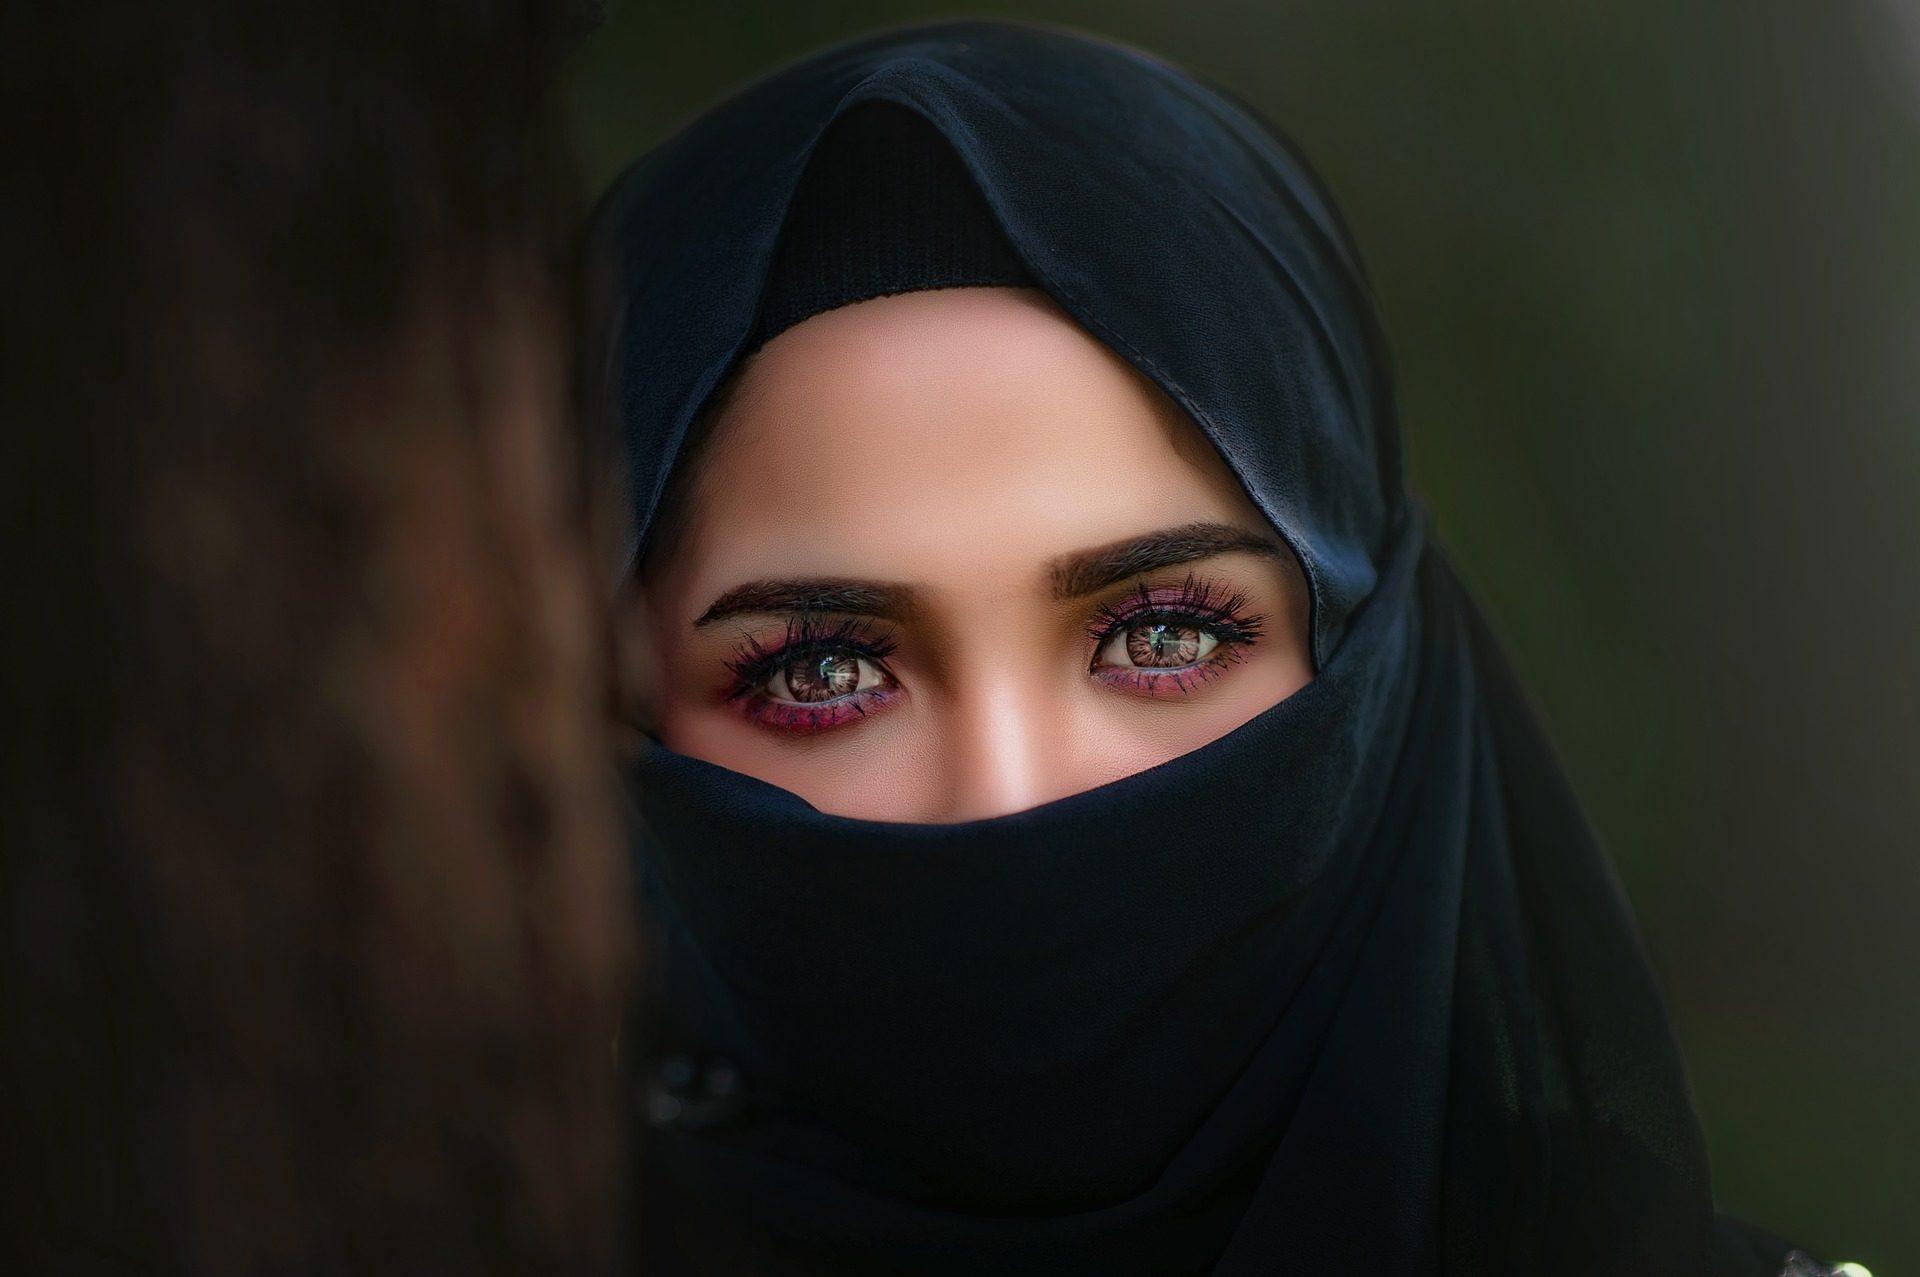 donna, occhi, sguardo, velo, hijab - Sfondi HD - Professor-falken.com